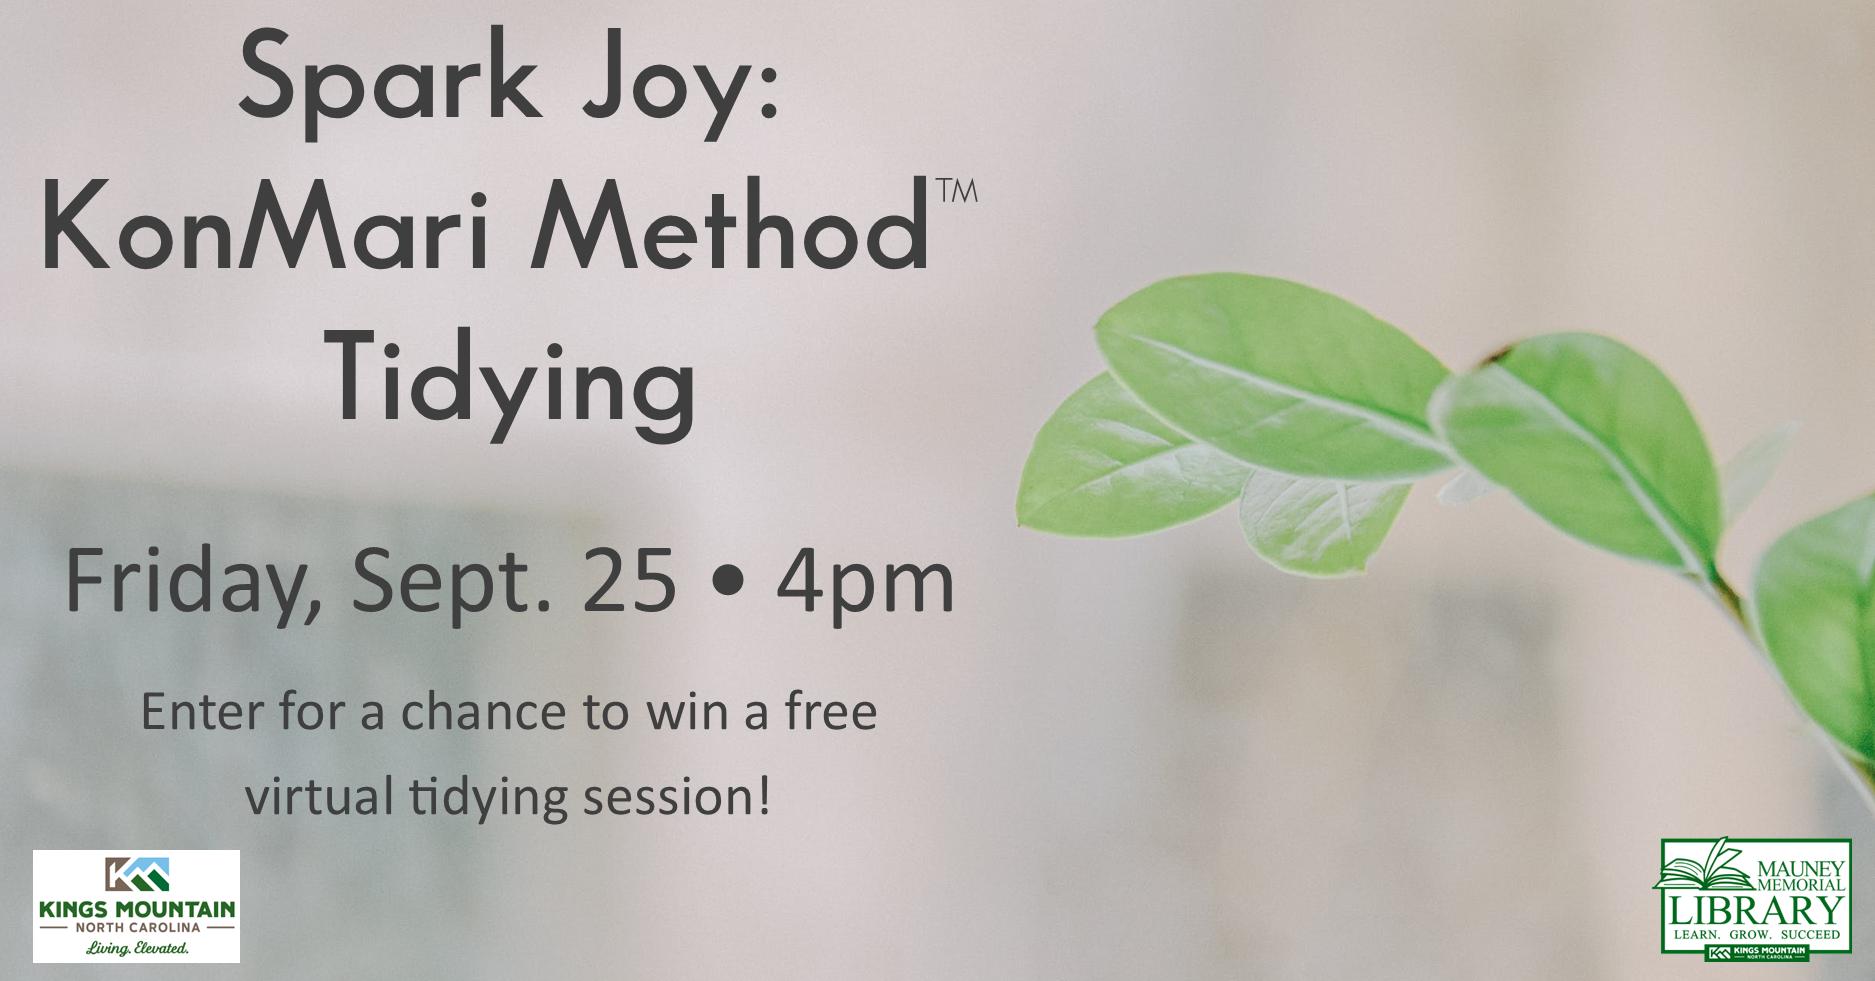 Spark Joy: KonMari Method Tidying